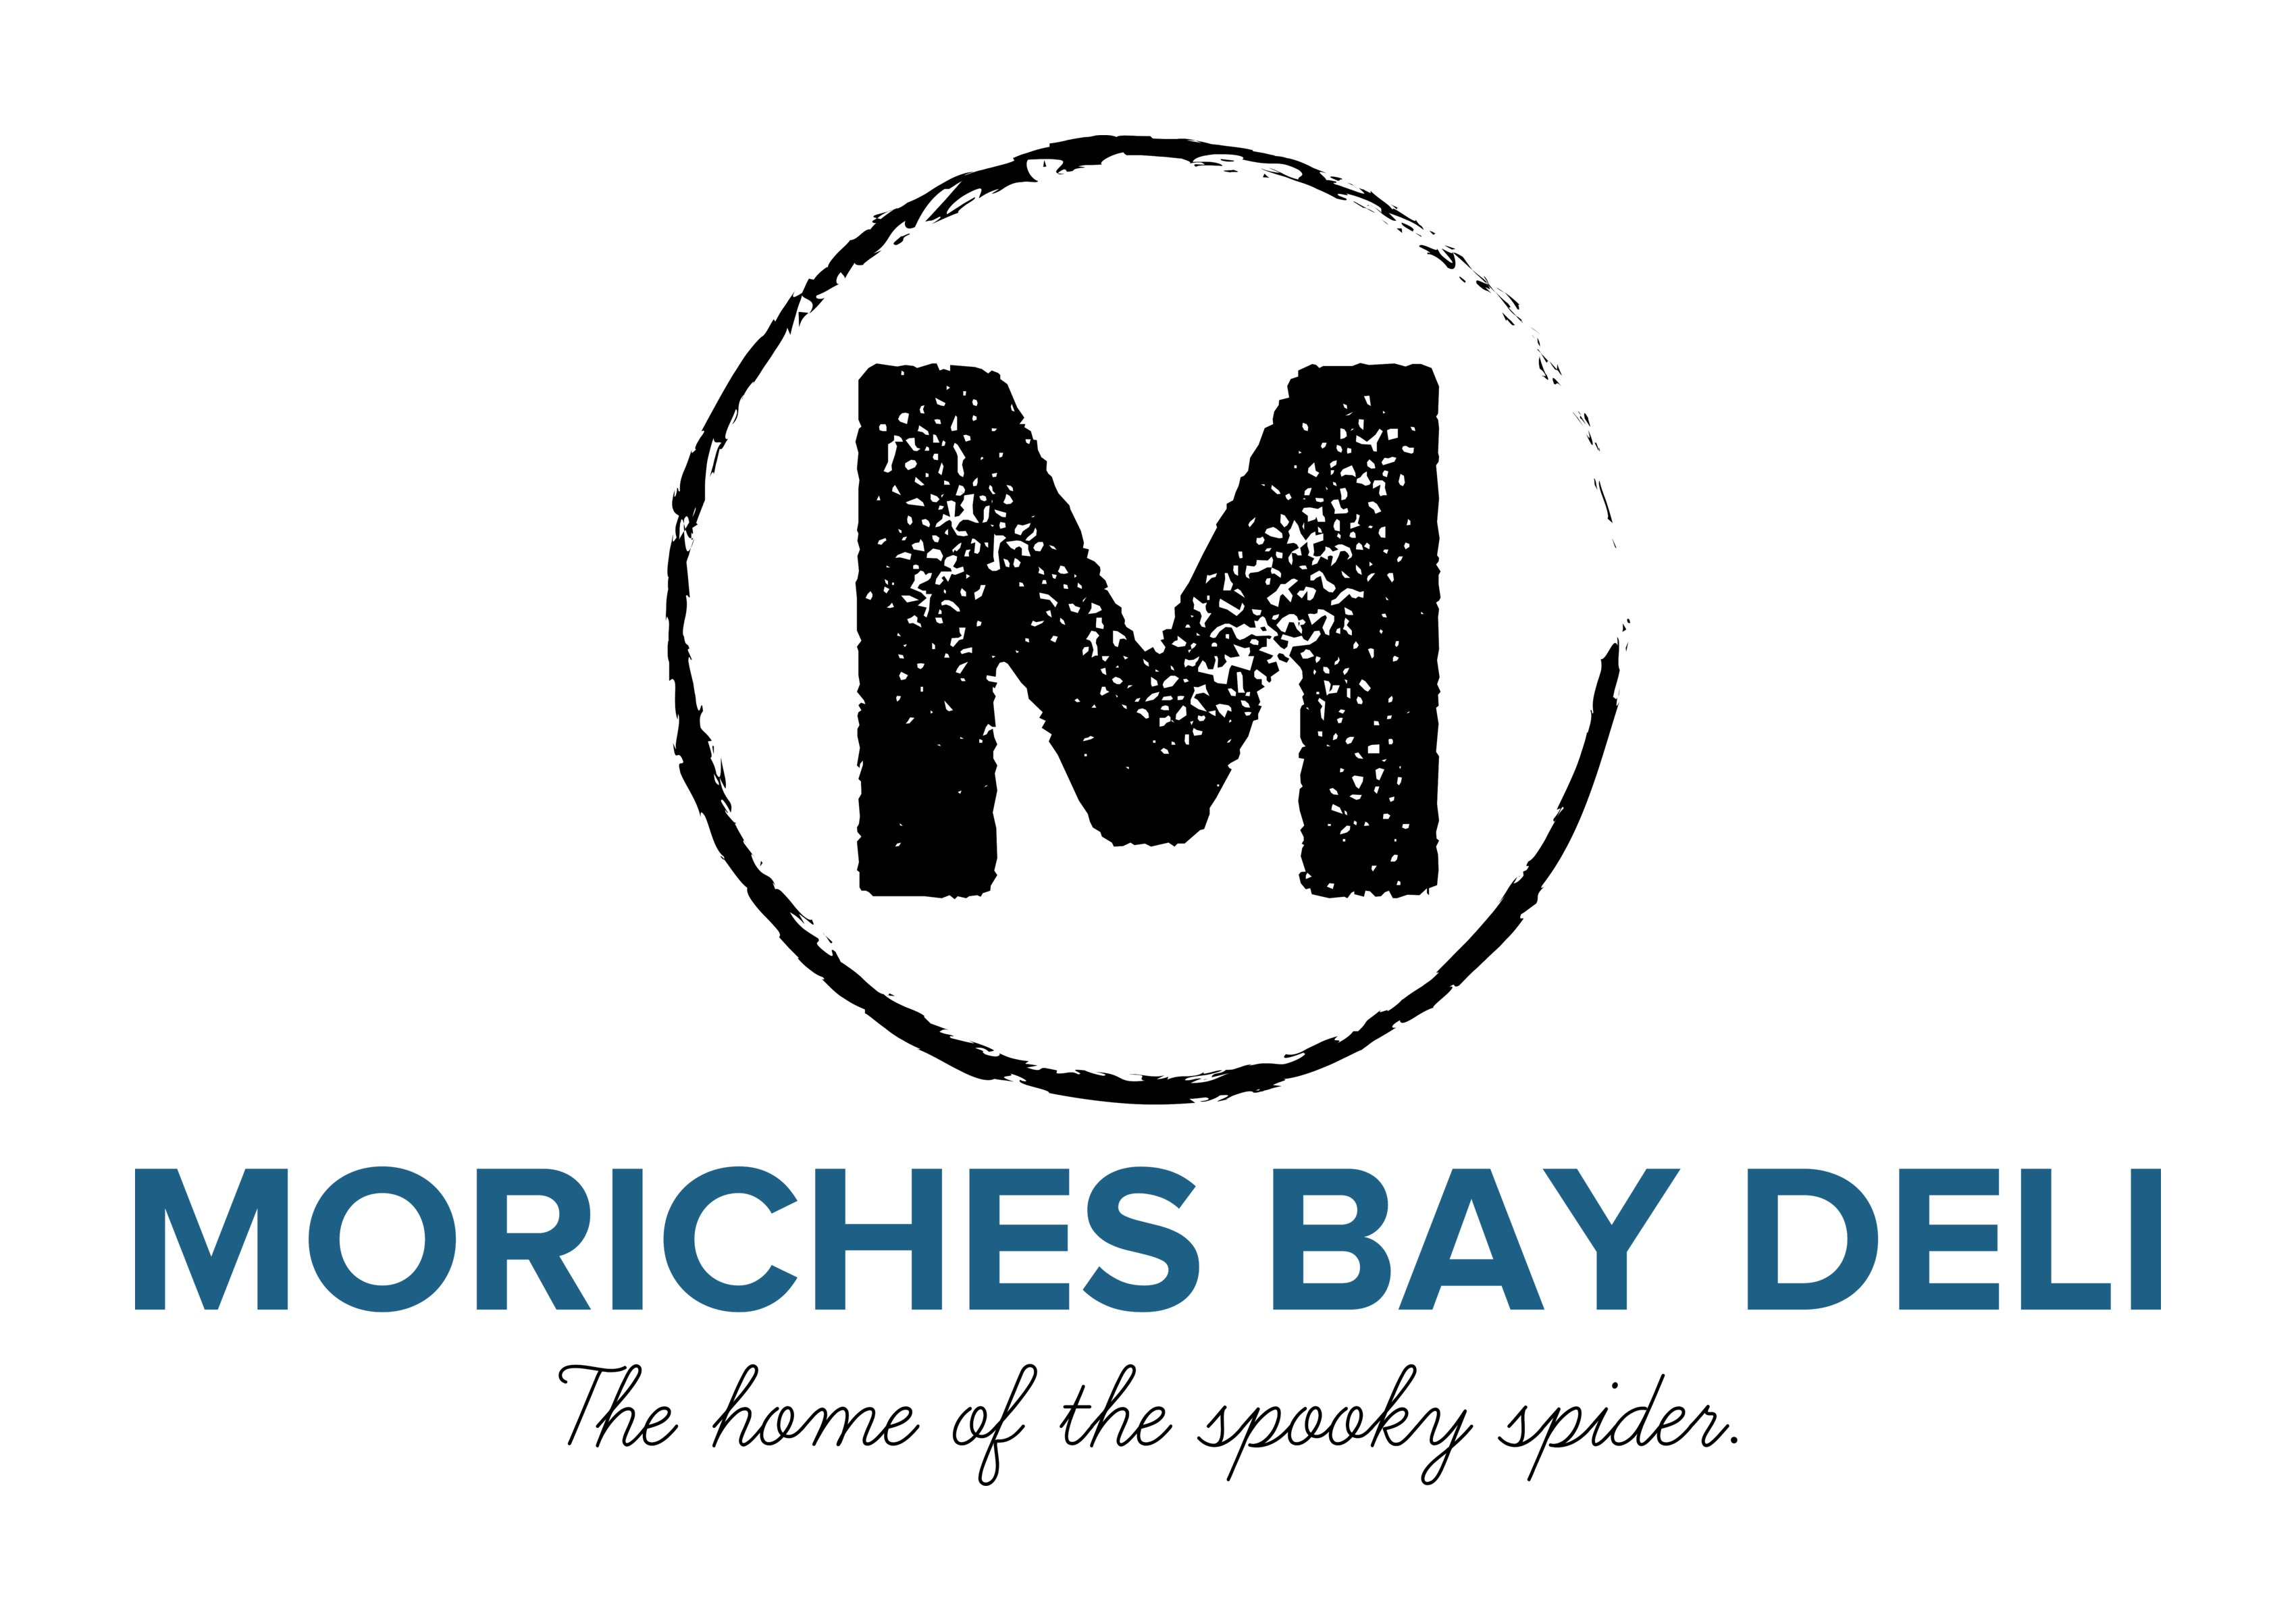 Moriches-Bay-Deli.jpg